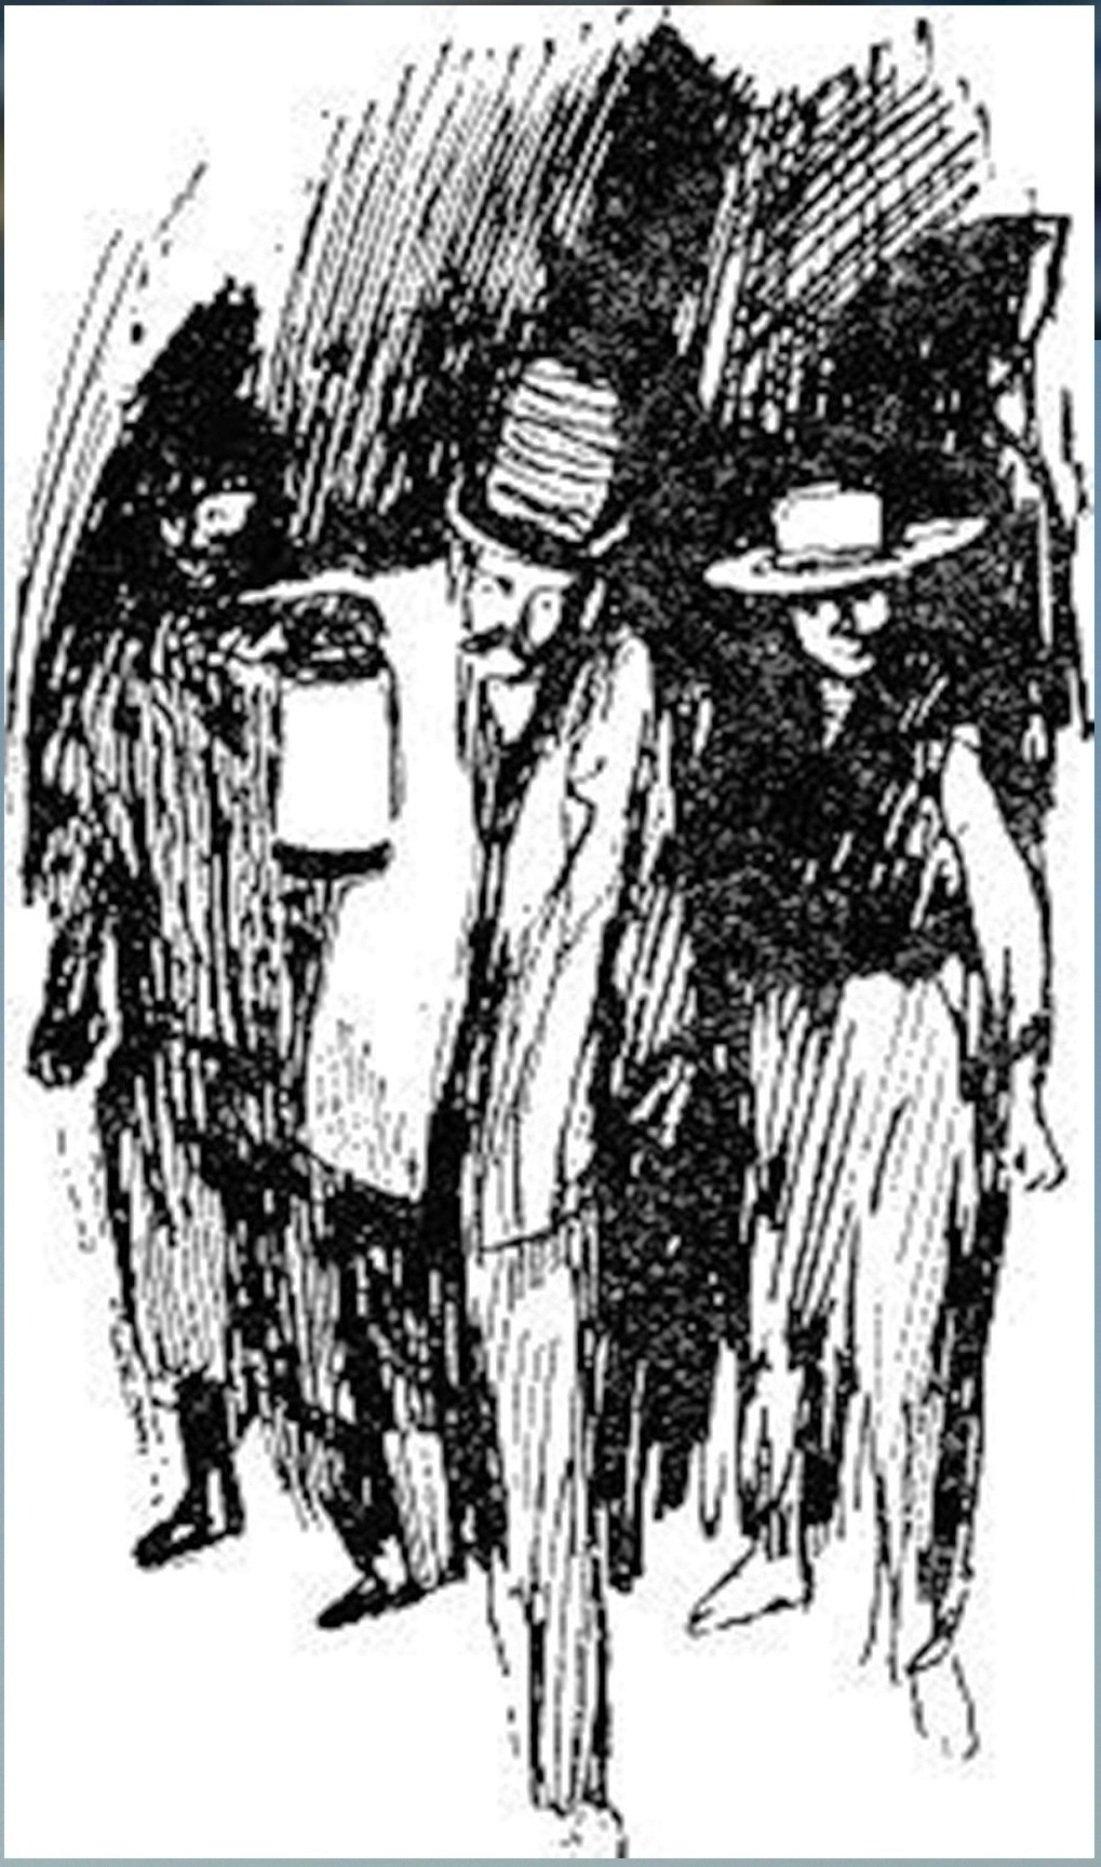 Иллюстрация В. Н. Горяева к пр-ю М.Твена Приключения Тома Сойера (36).